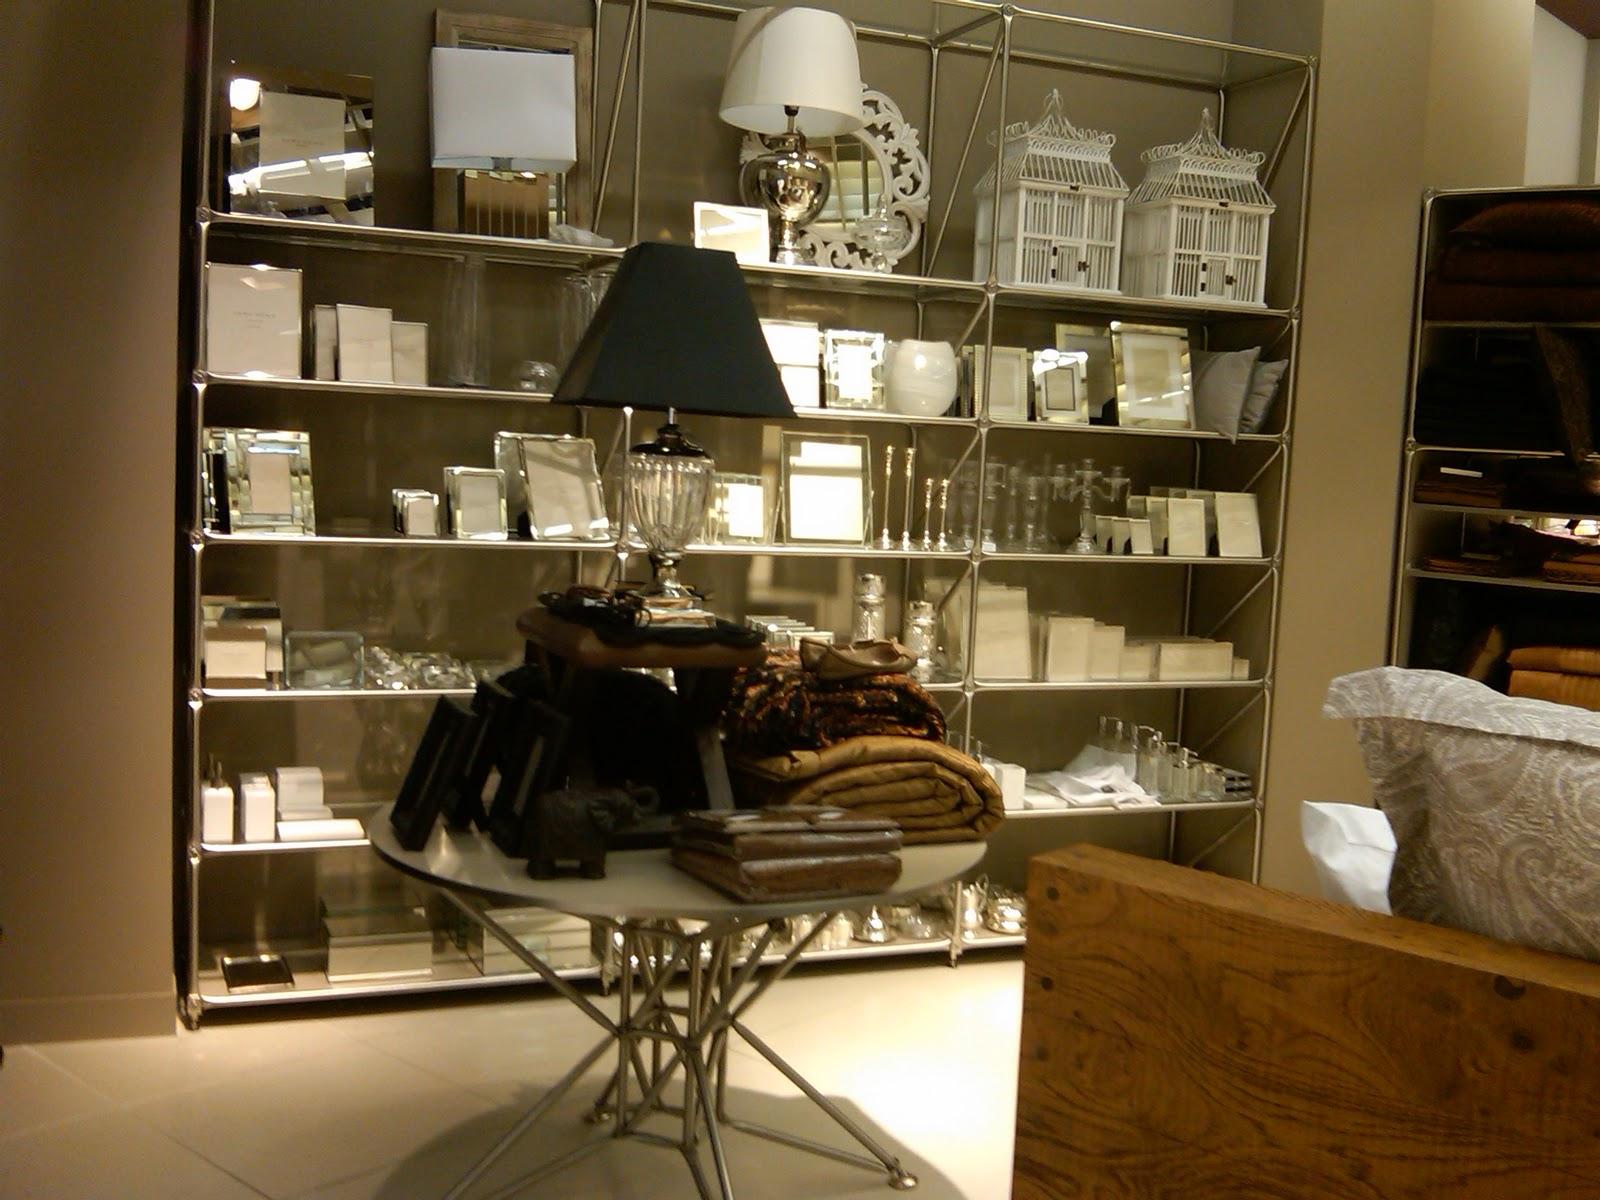 Beau lifestyle zara home - Zara home online espana ...